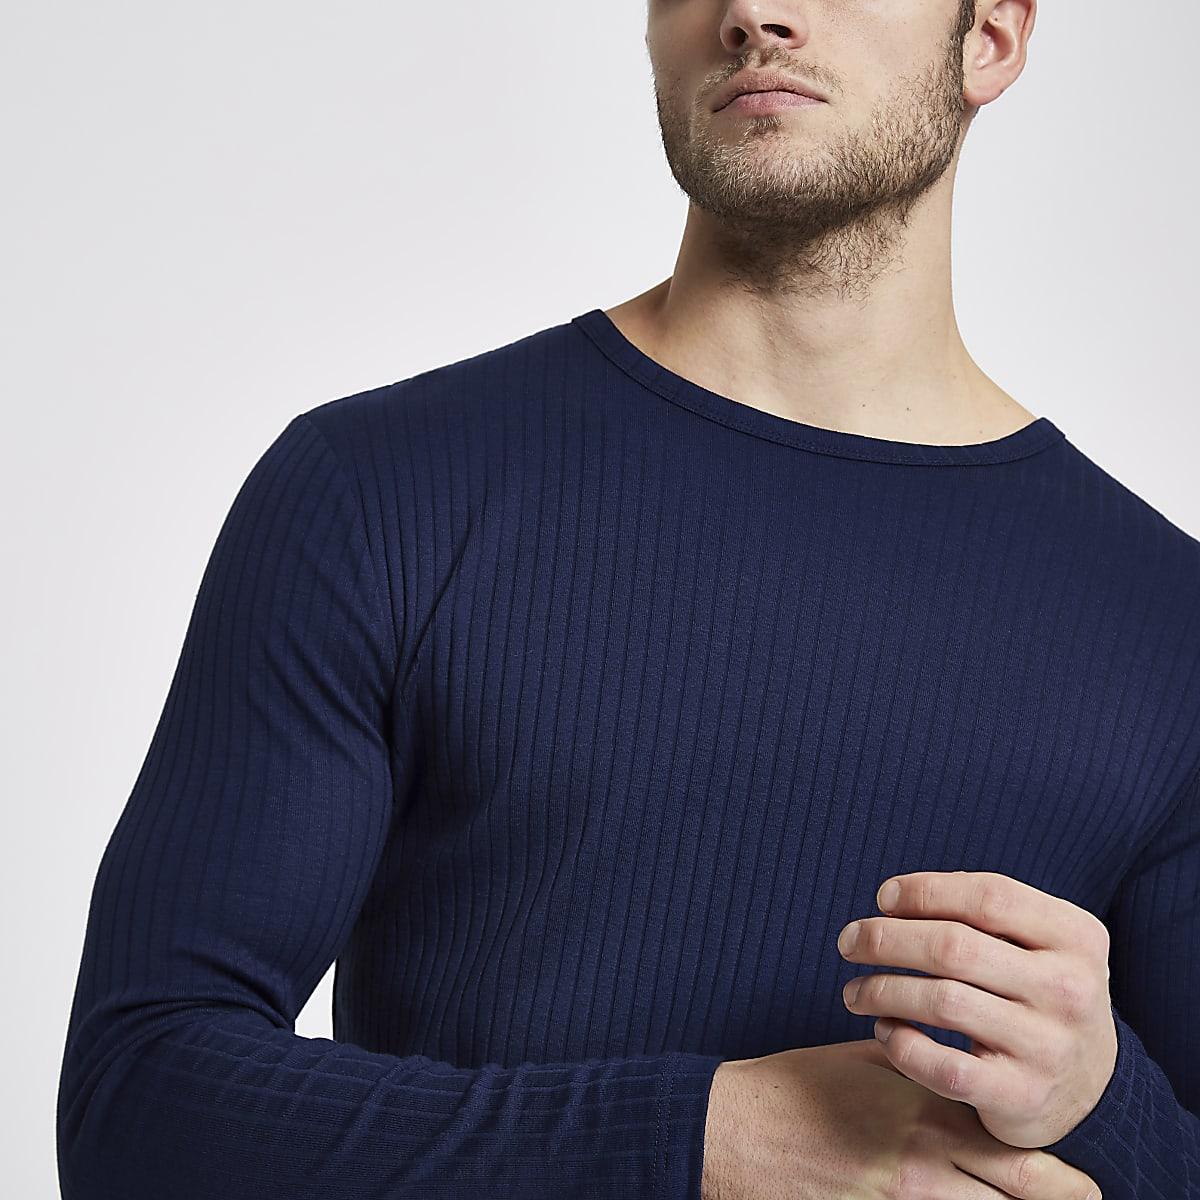 a3bfe64cda7df7 Dark blue ribbed slim fit T-shirt - Long Sleeve T-Shirts - T-Shirts ...